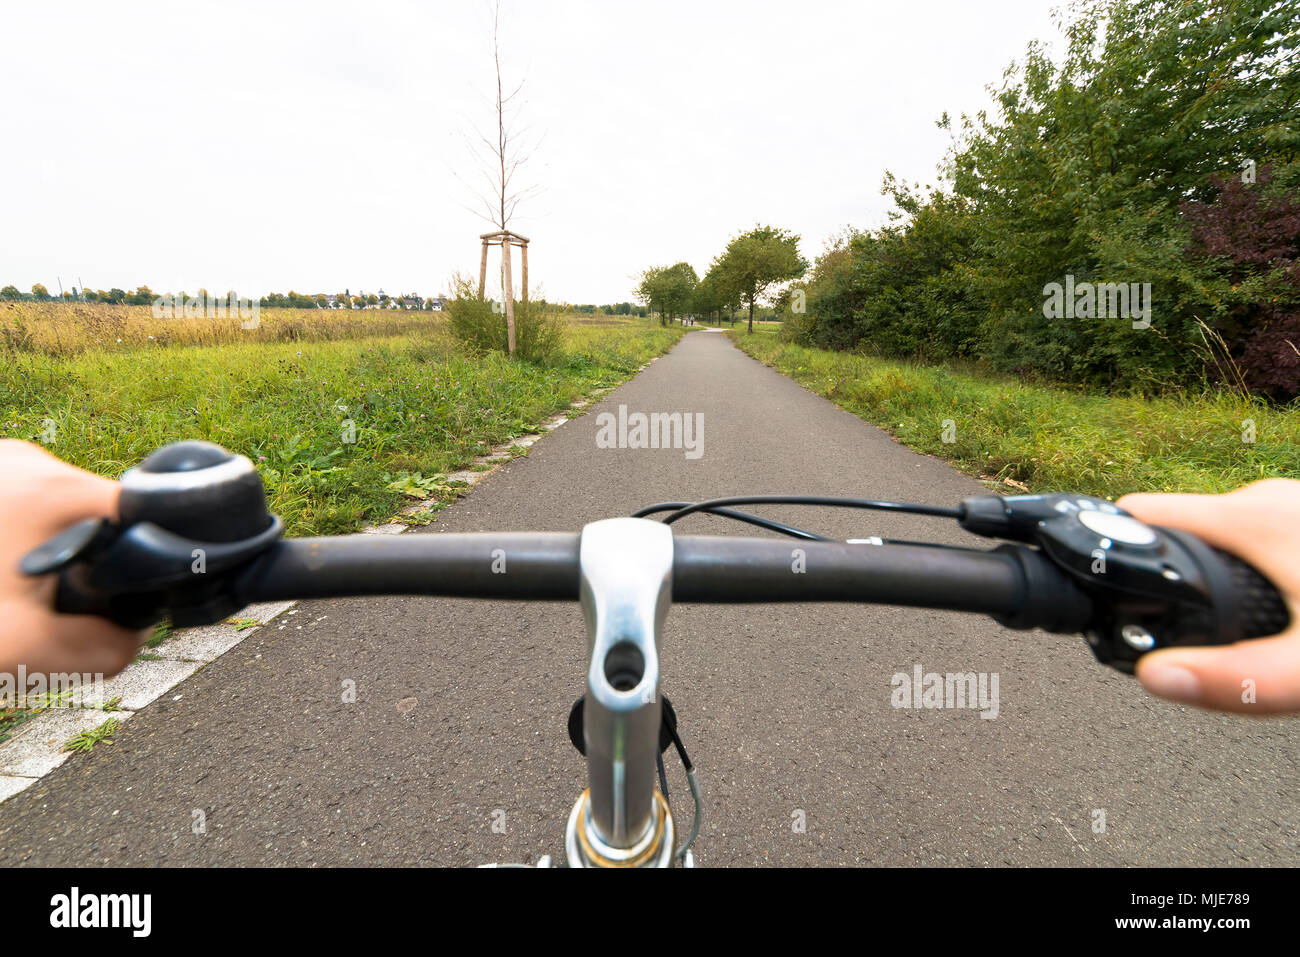 cyclist, detail, hands, handlebars - Stock Image